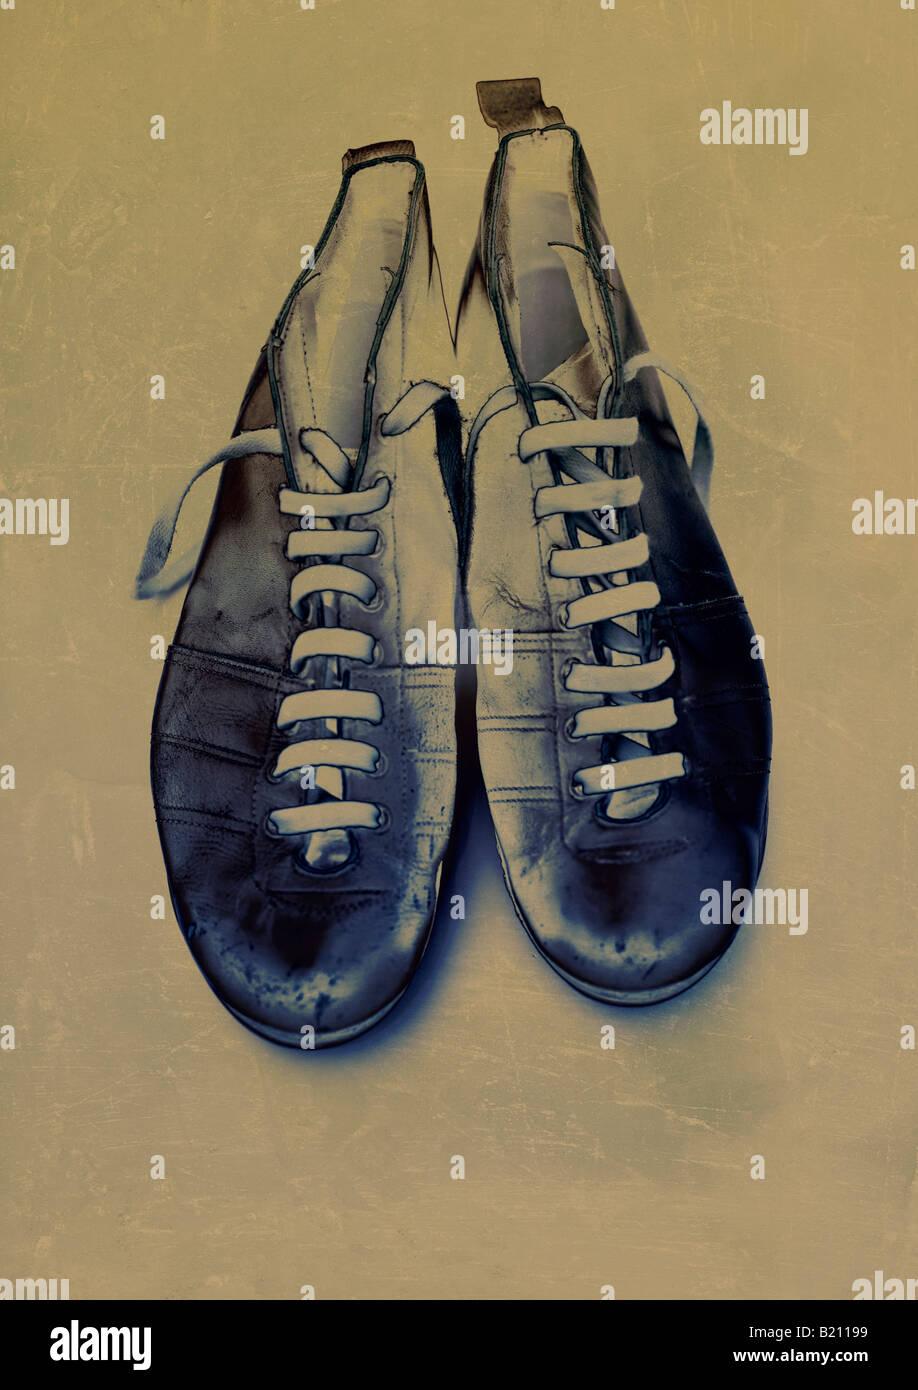 Illustration des chaussures de football Photo Stock